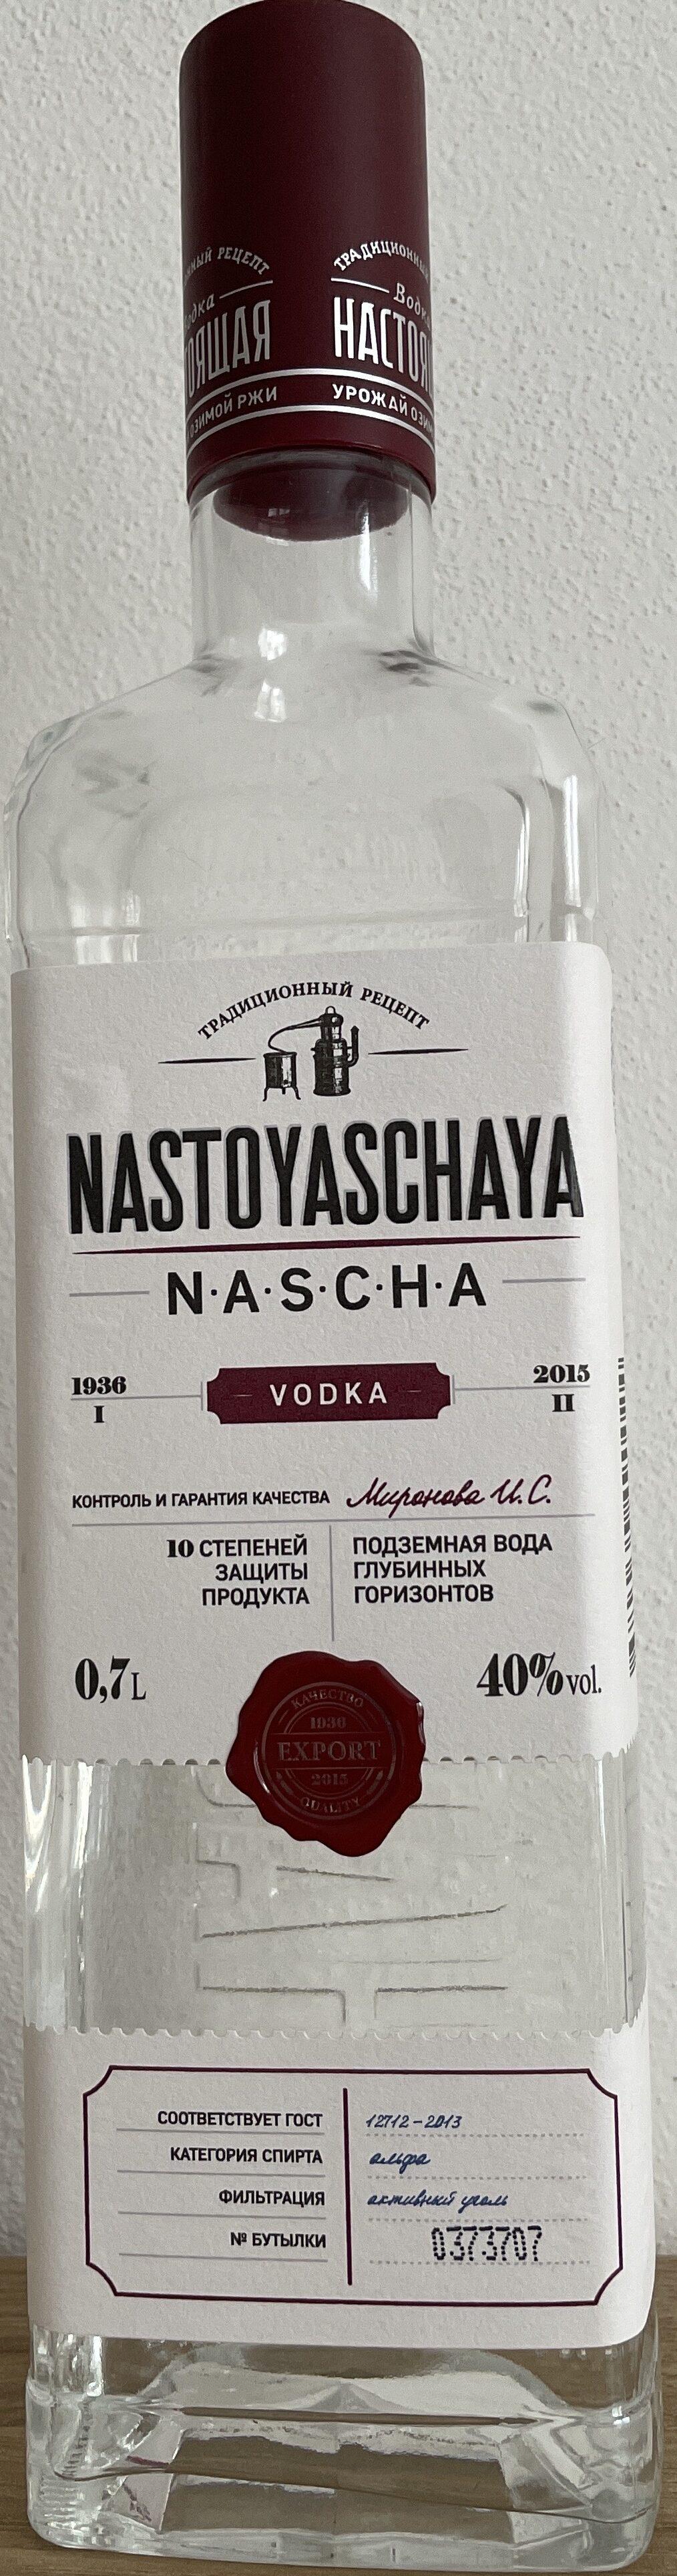 Nastoyaschaya Vodka - Produit - de